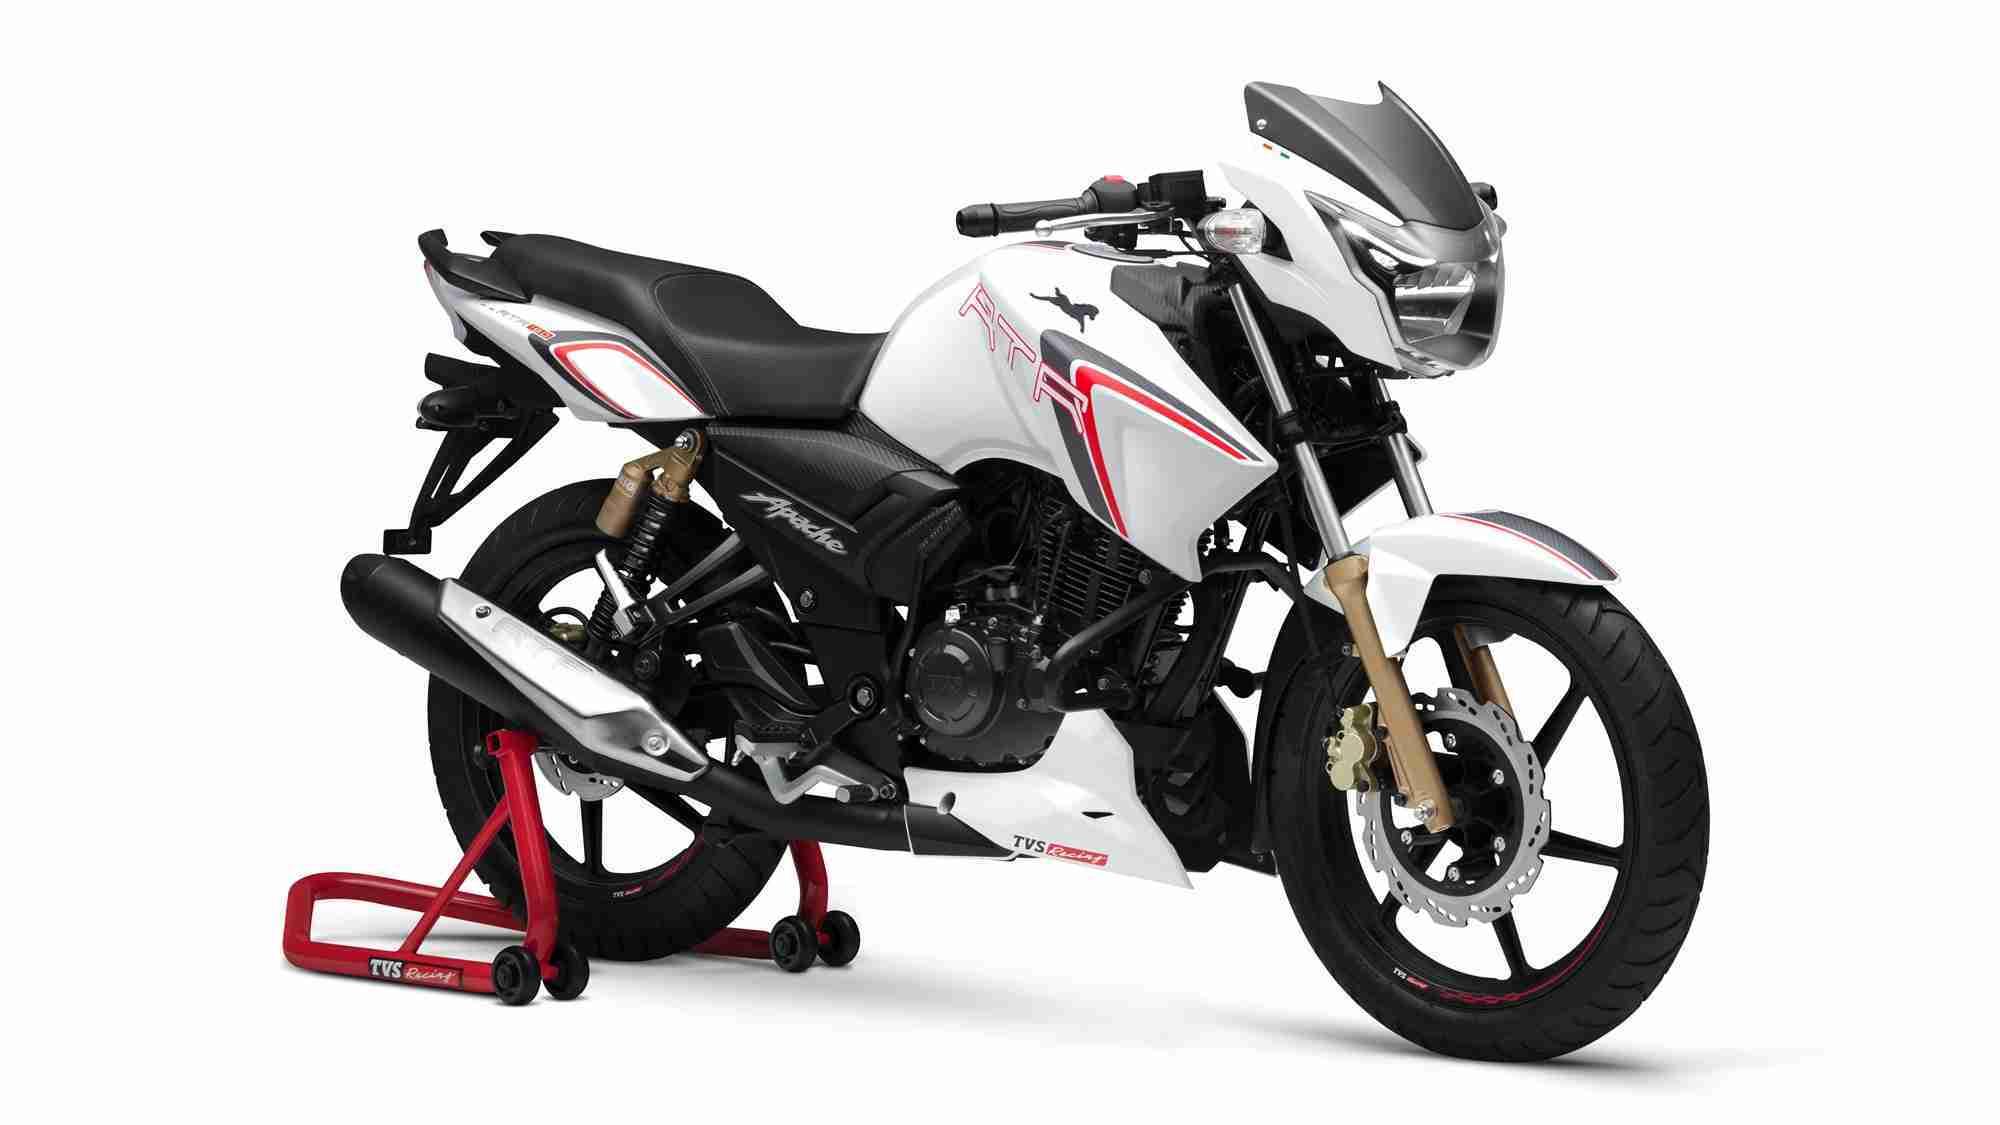 Apache RTR 180 Race Edition